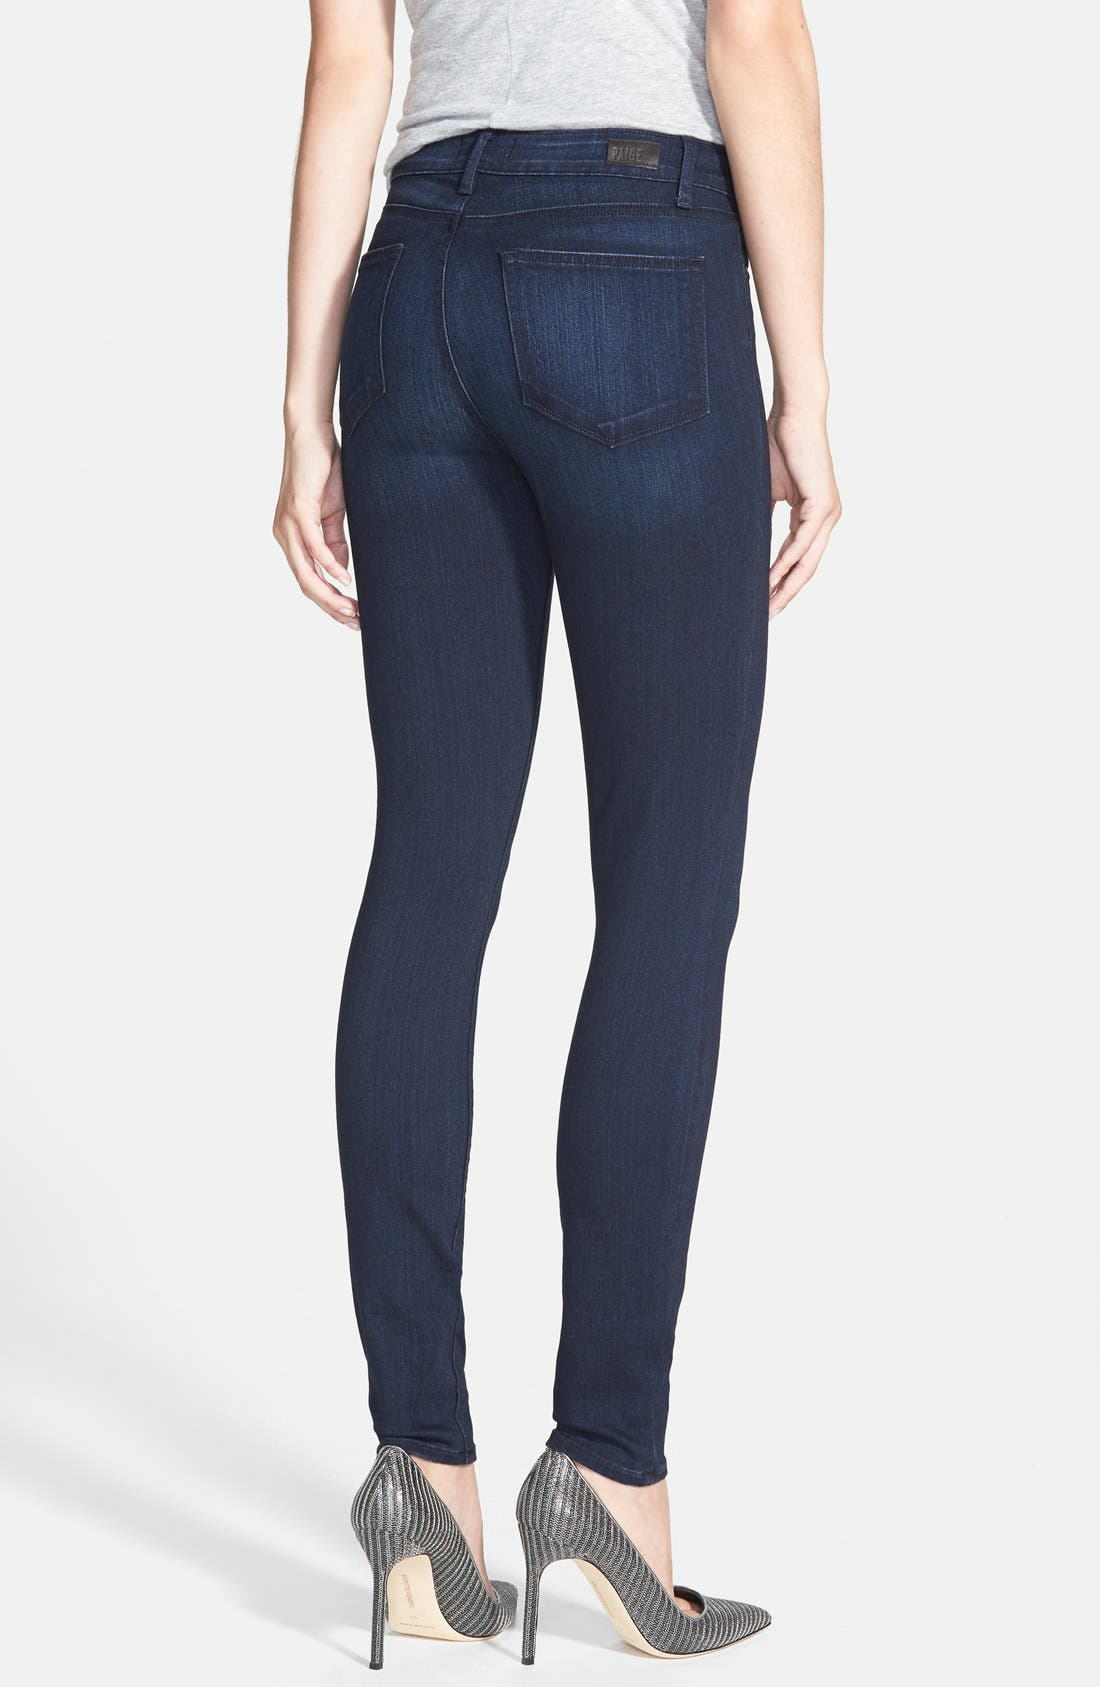 Denim 'Transcend - Hoxton' High Rise Ultra Skinny Jeans,                             Alternate thumbnail 2, color,                             Mae